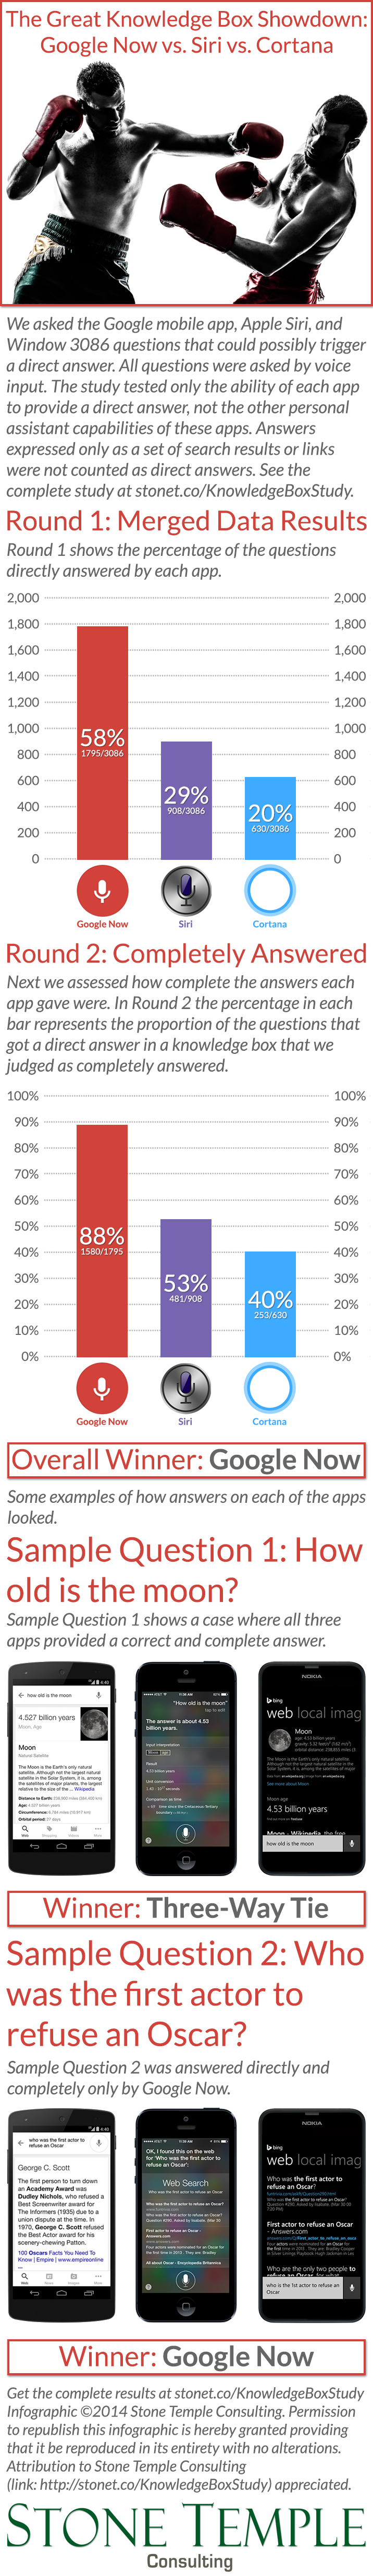 Voice App Answers Study: Google vs Siri vs Cortana (Infographic